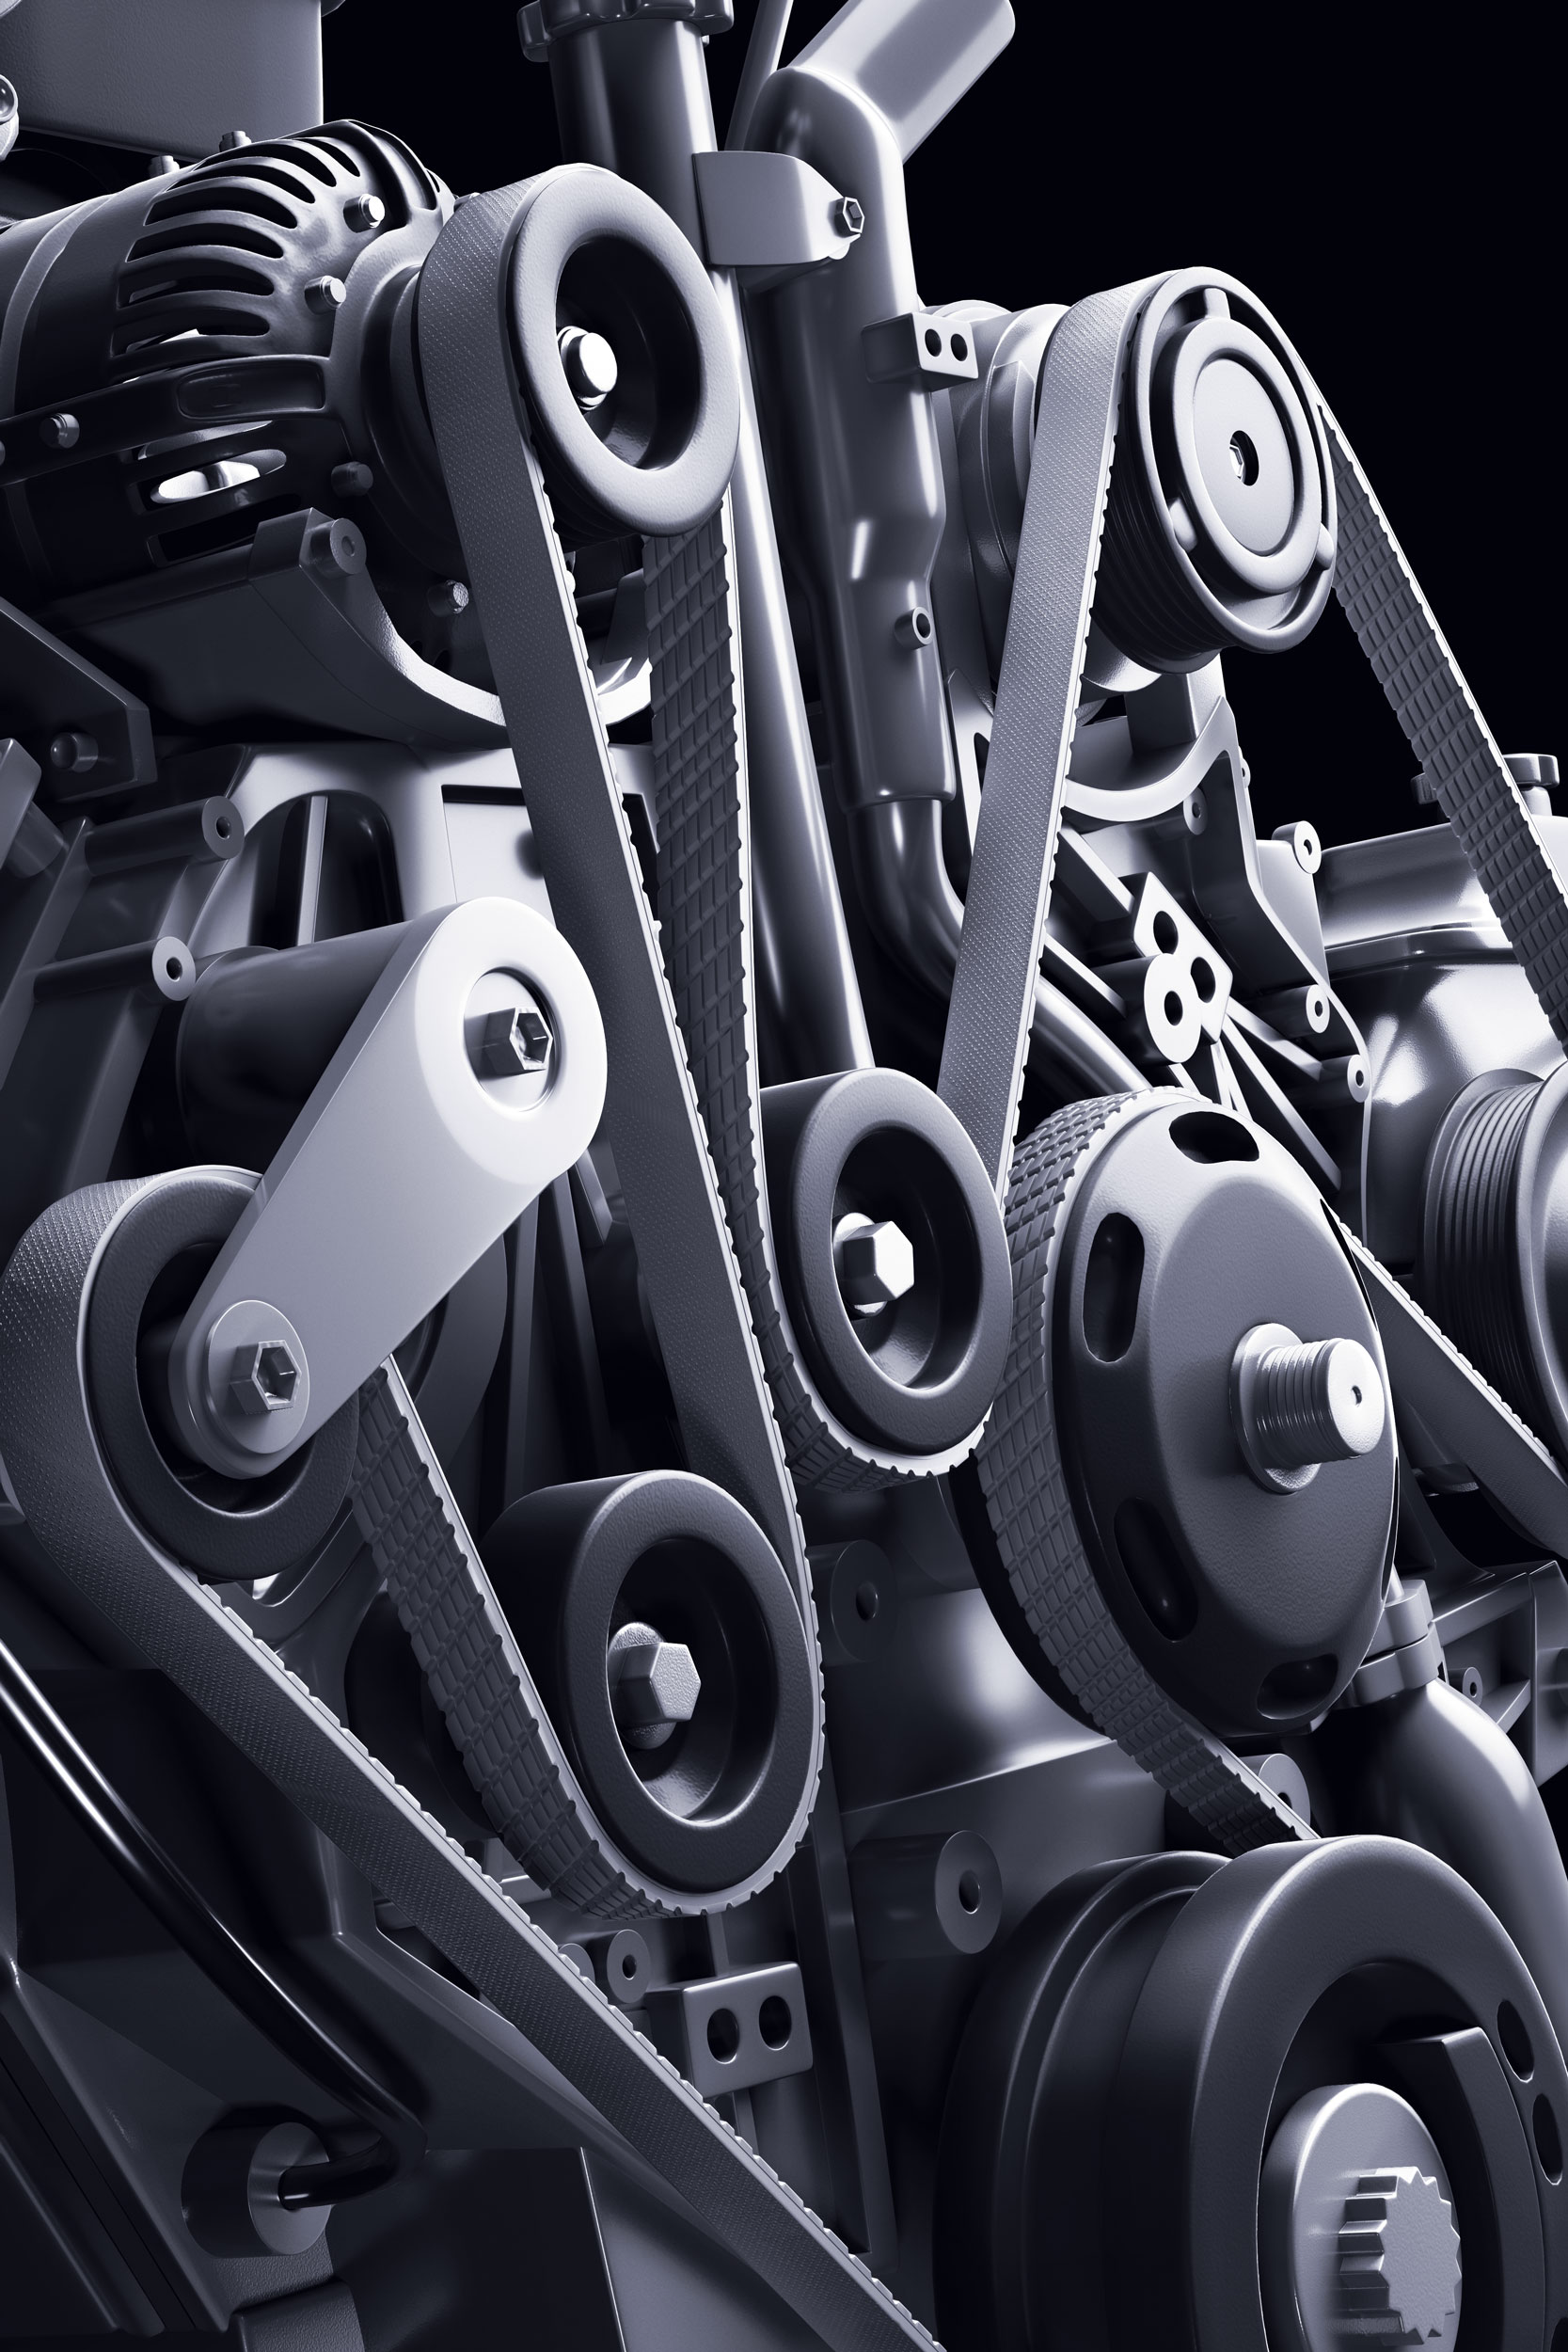 cgi photo of gears